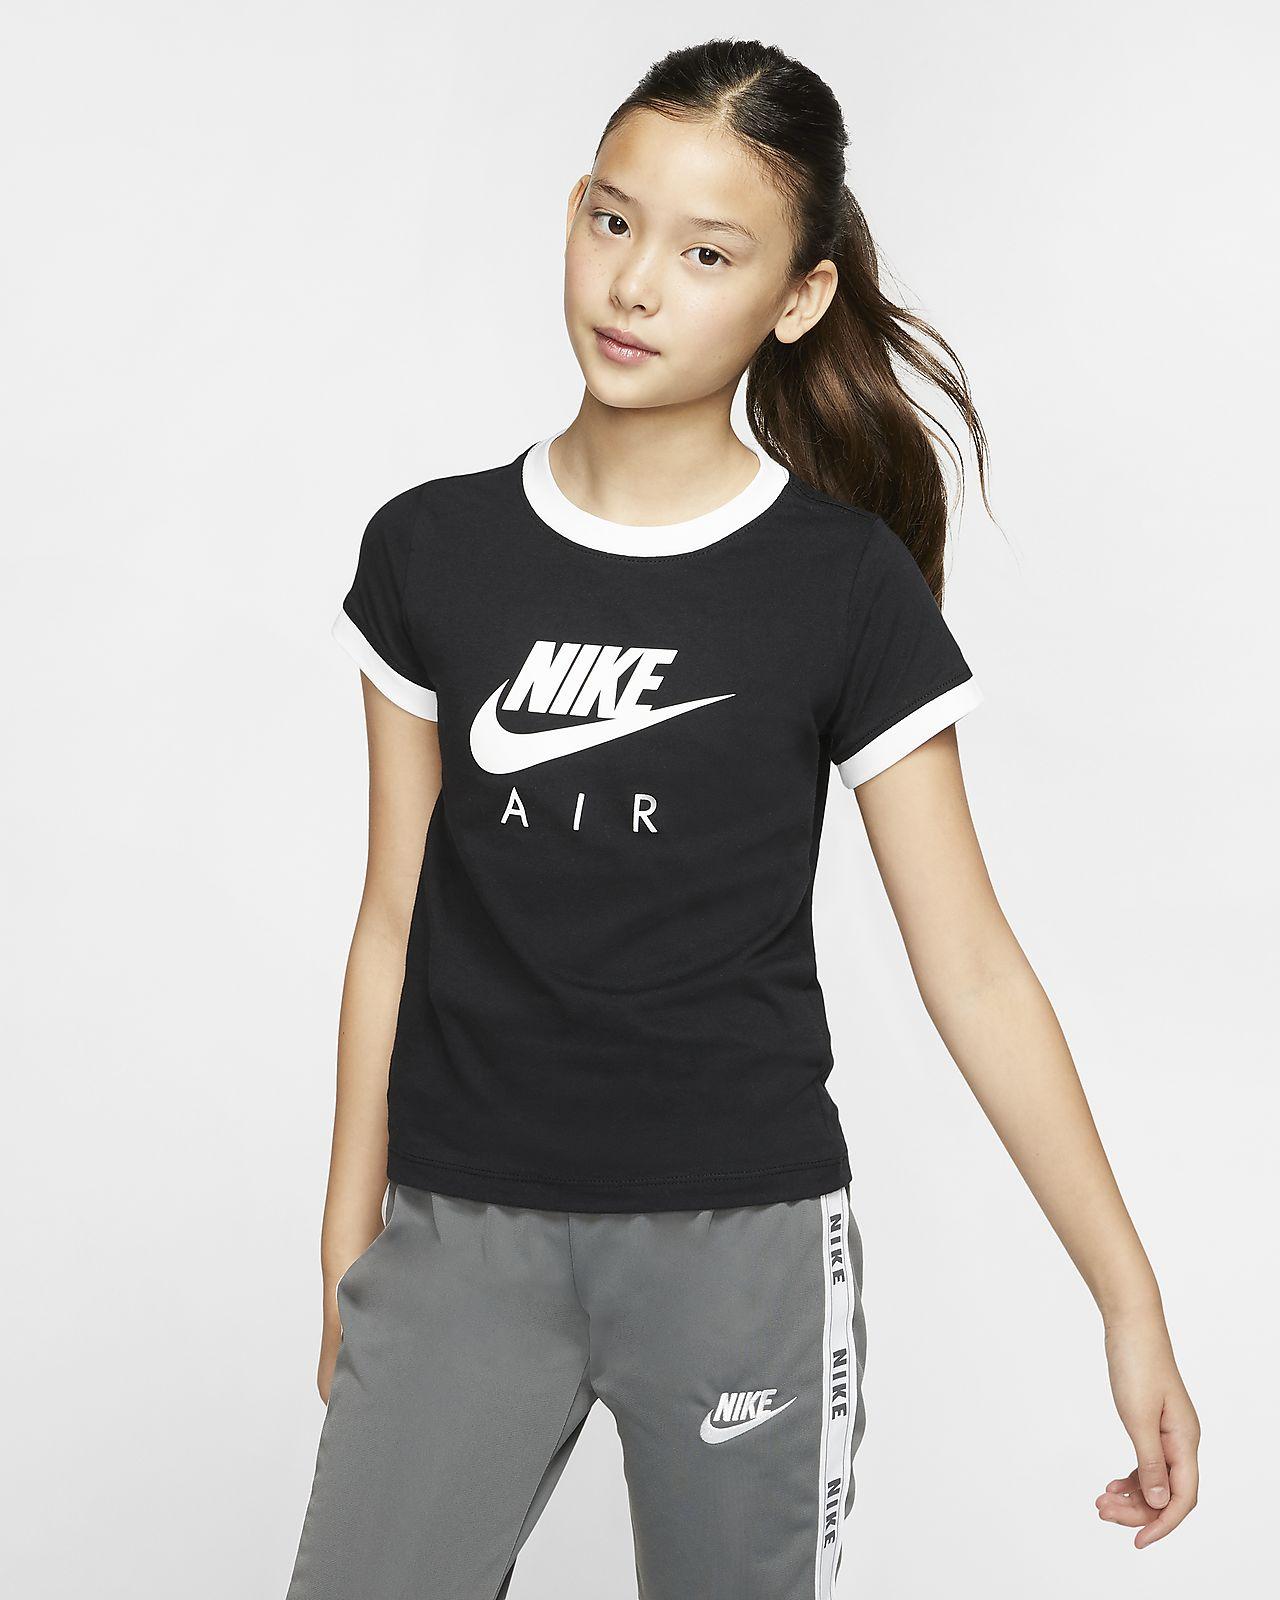 T-Shirt Nike Air για μεγάλα παιδιά